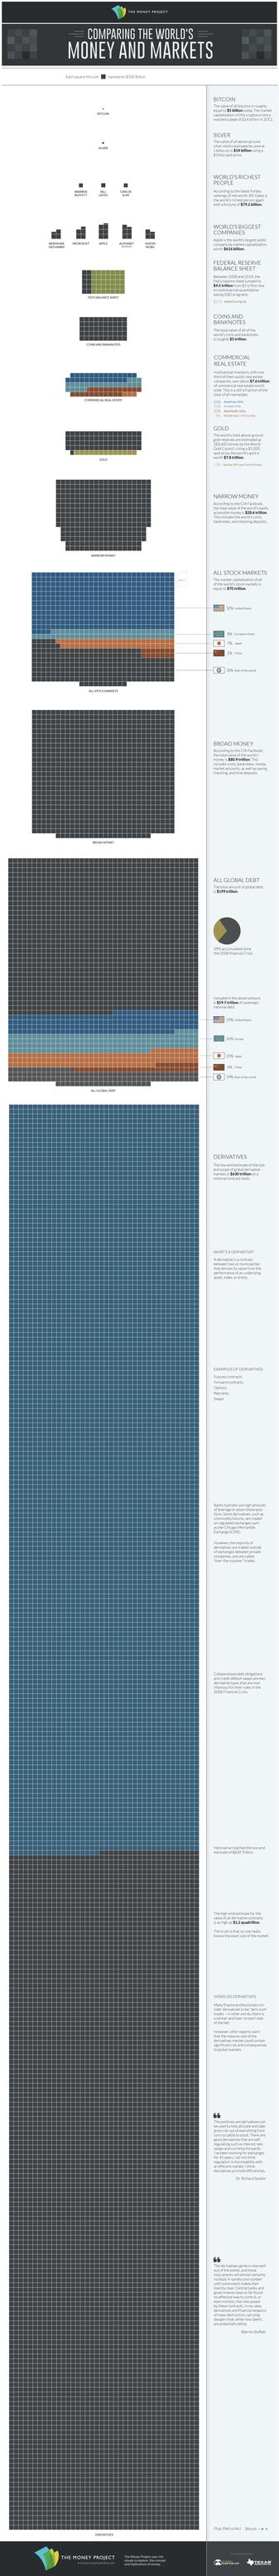 Ricchezza nel mondo, infografica